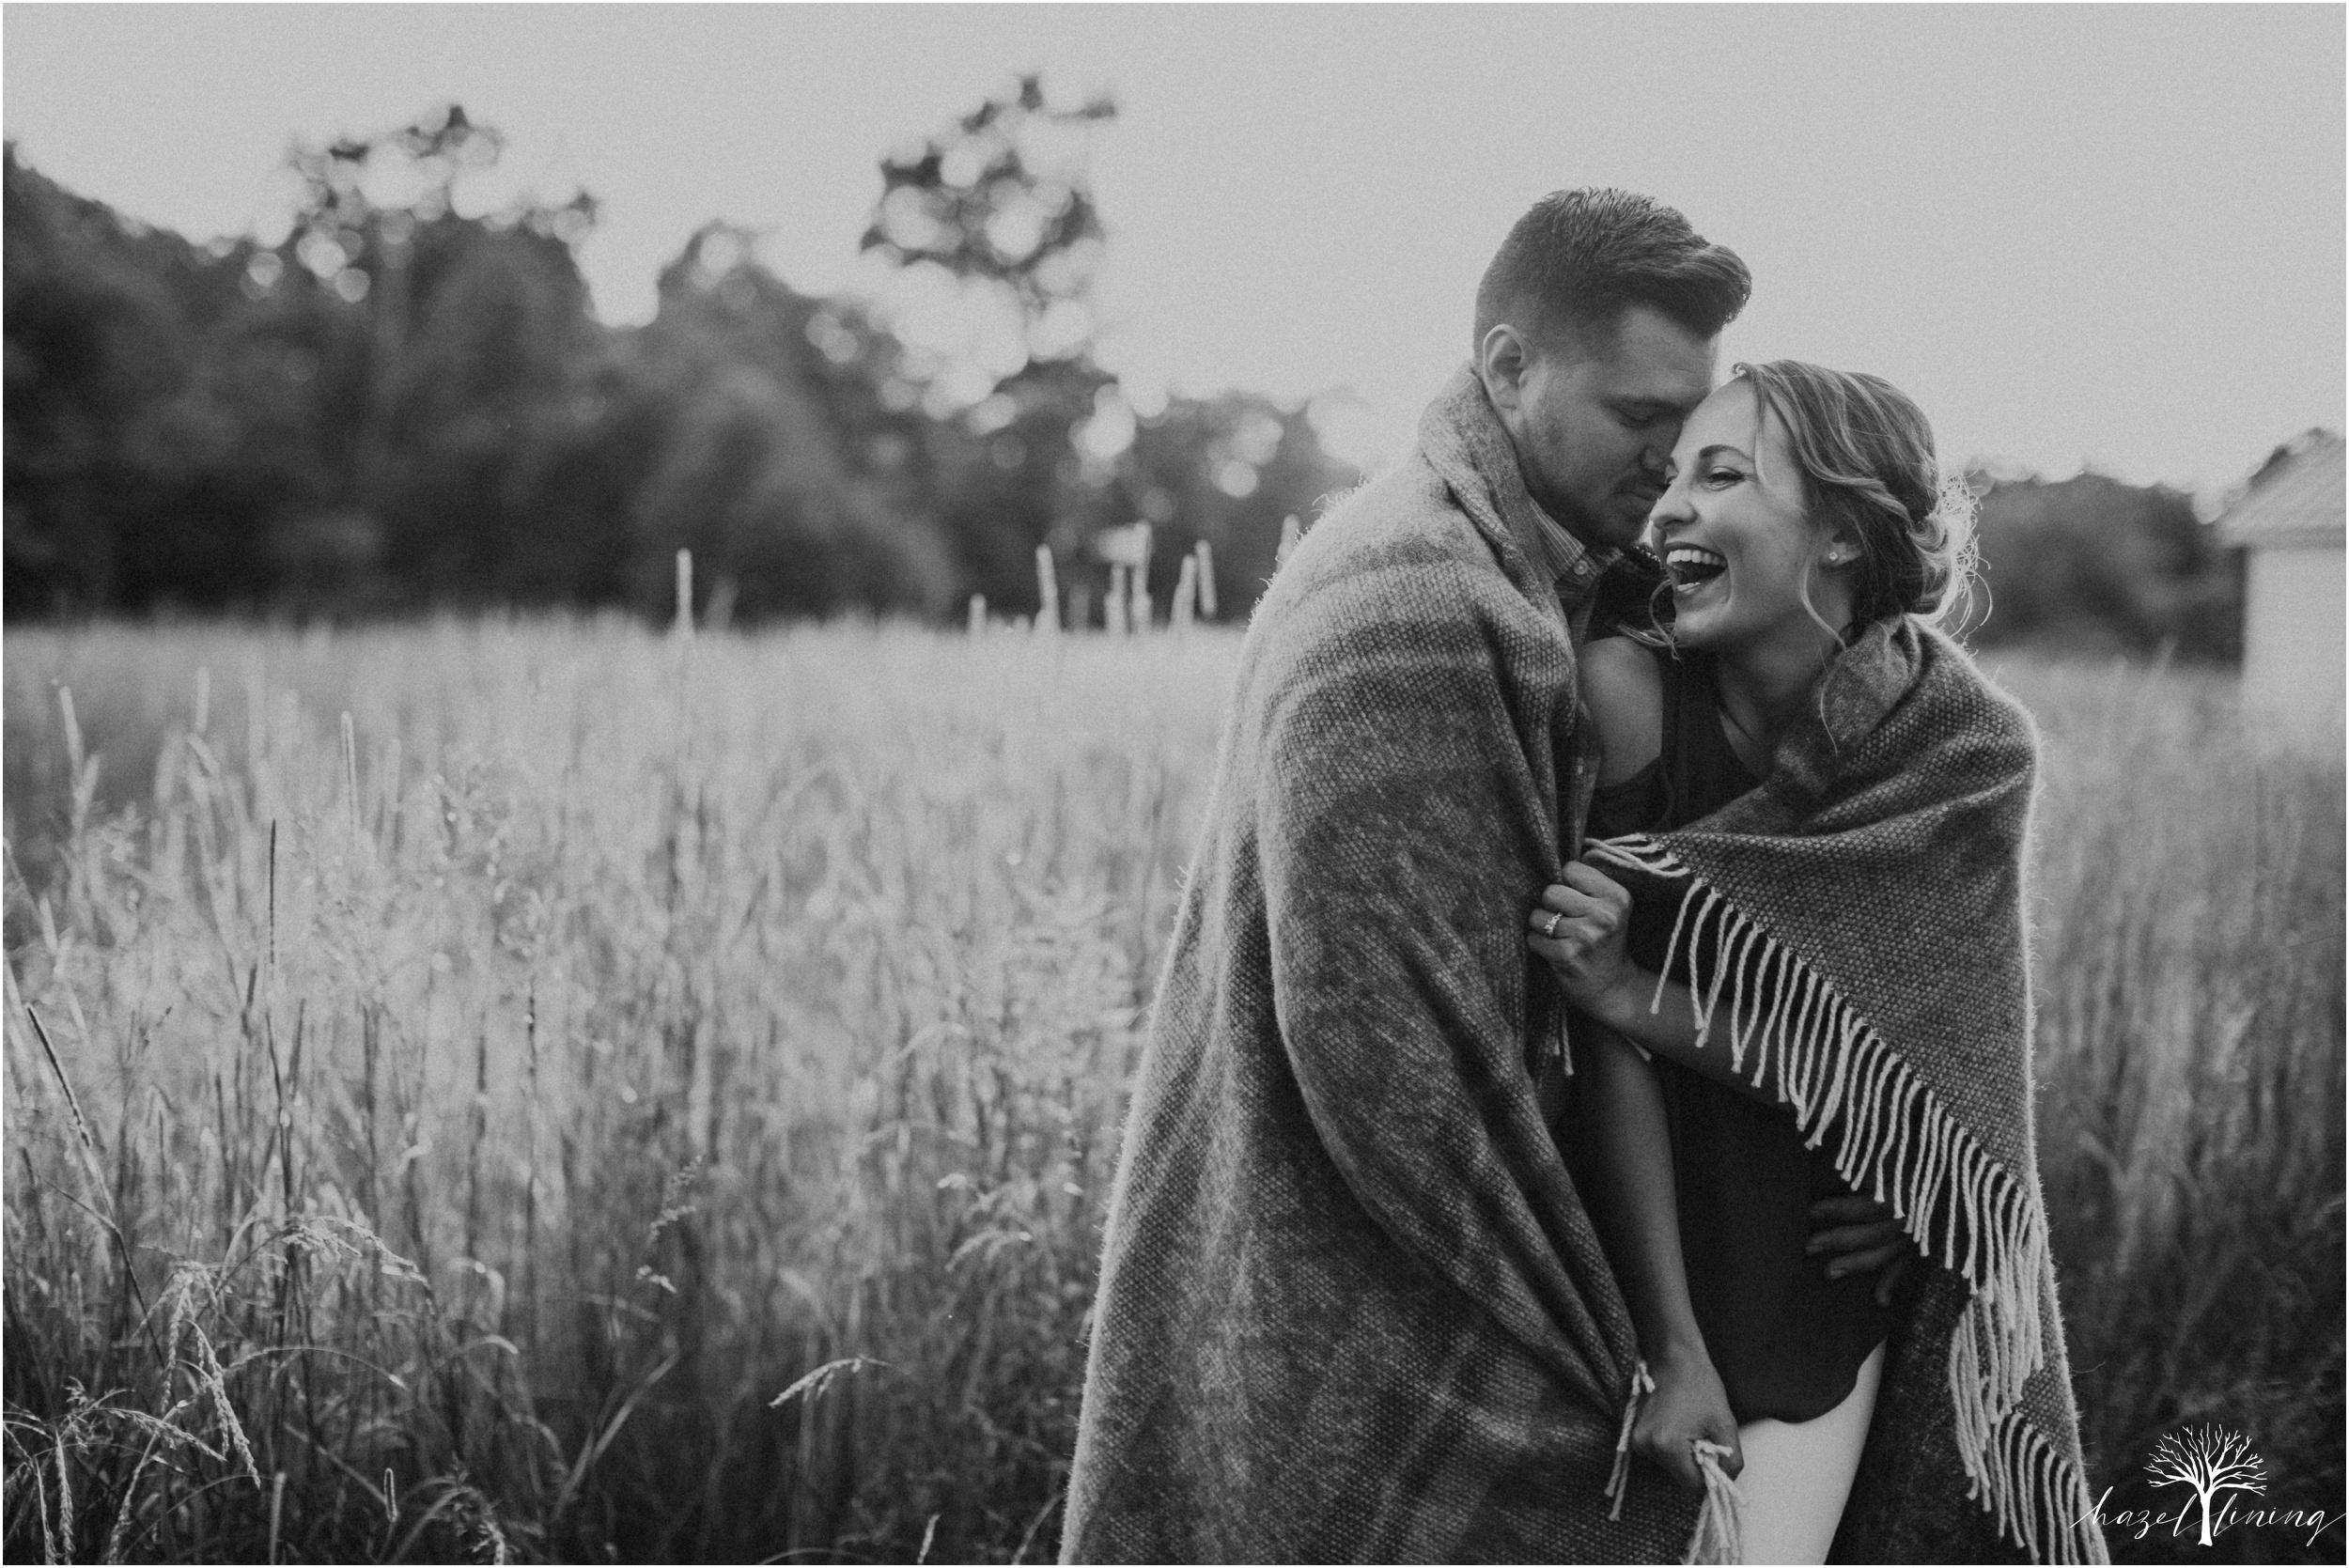 rachel-warner-chris-niedrist-the-farm-bakery-and-events-quakertown-pa-summer-engagement-hazel-lining-photography-destination-elopement-wedding-engagement-photography_0077.jpg